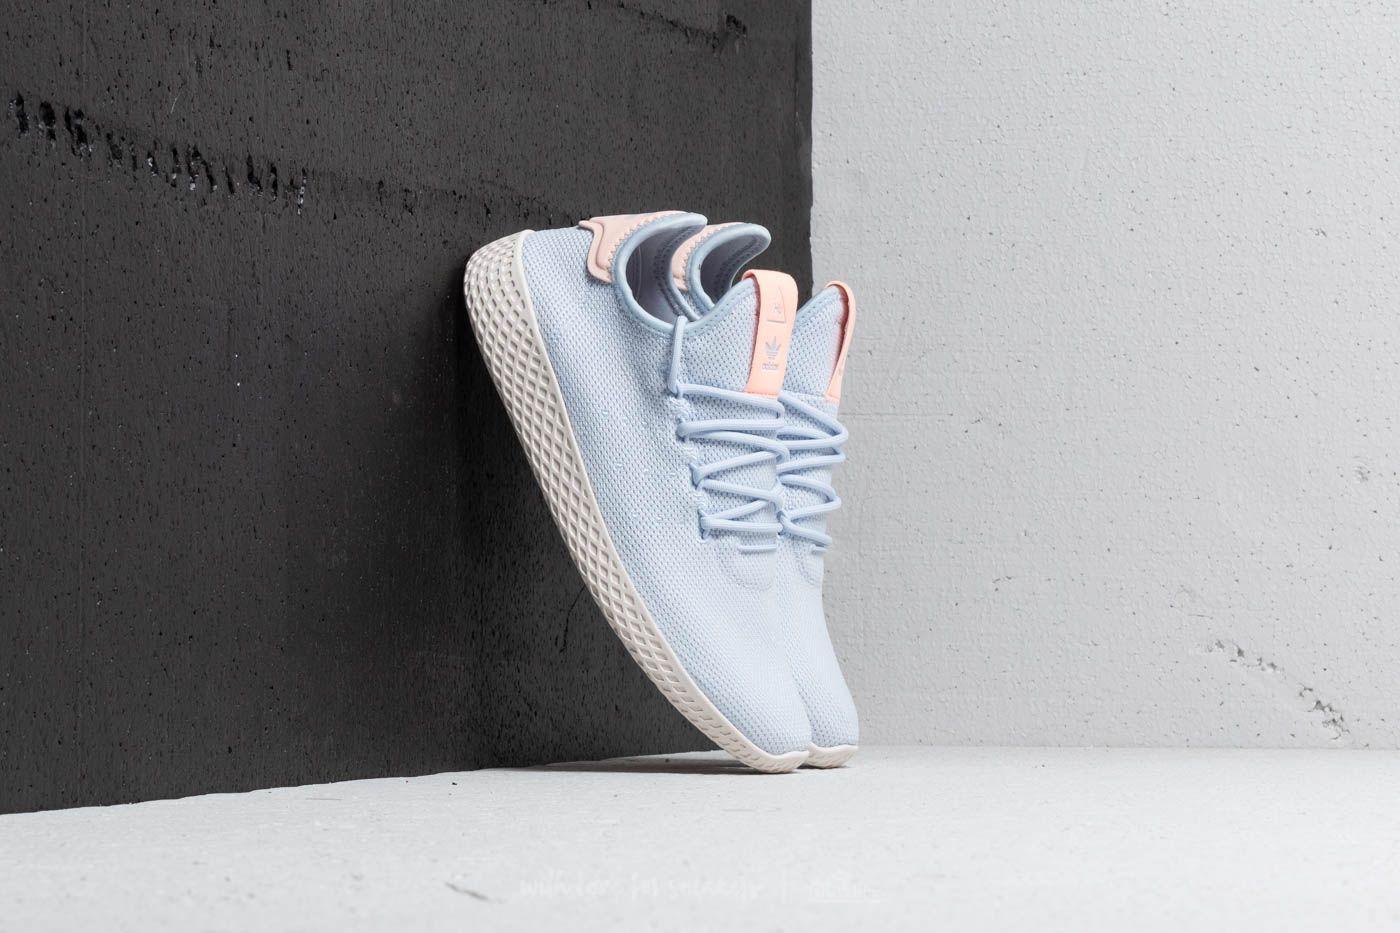 827fb1042e4 adidas Pharrell Williams Tennis HU W Aero Blue/ Aero Blue/ Chalk ...